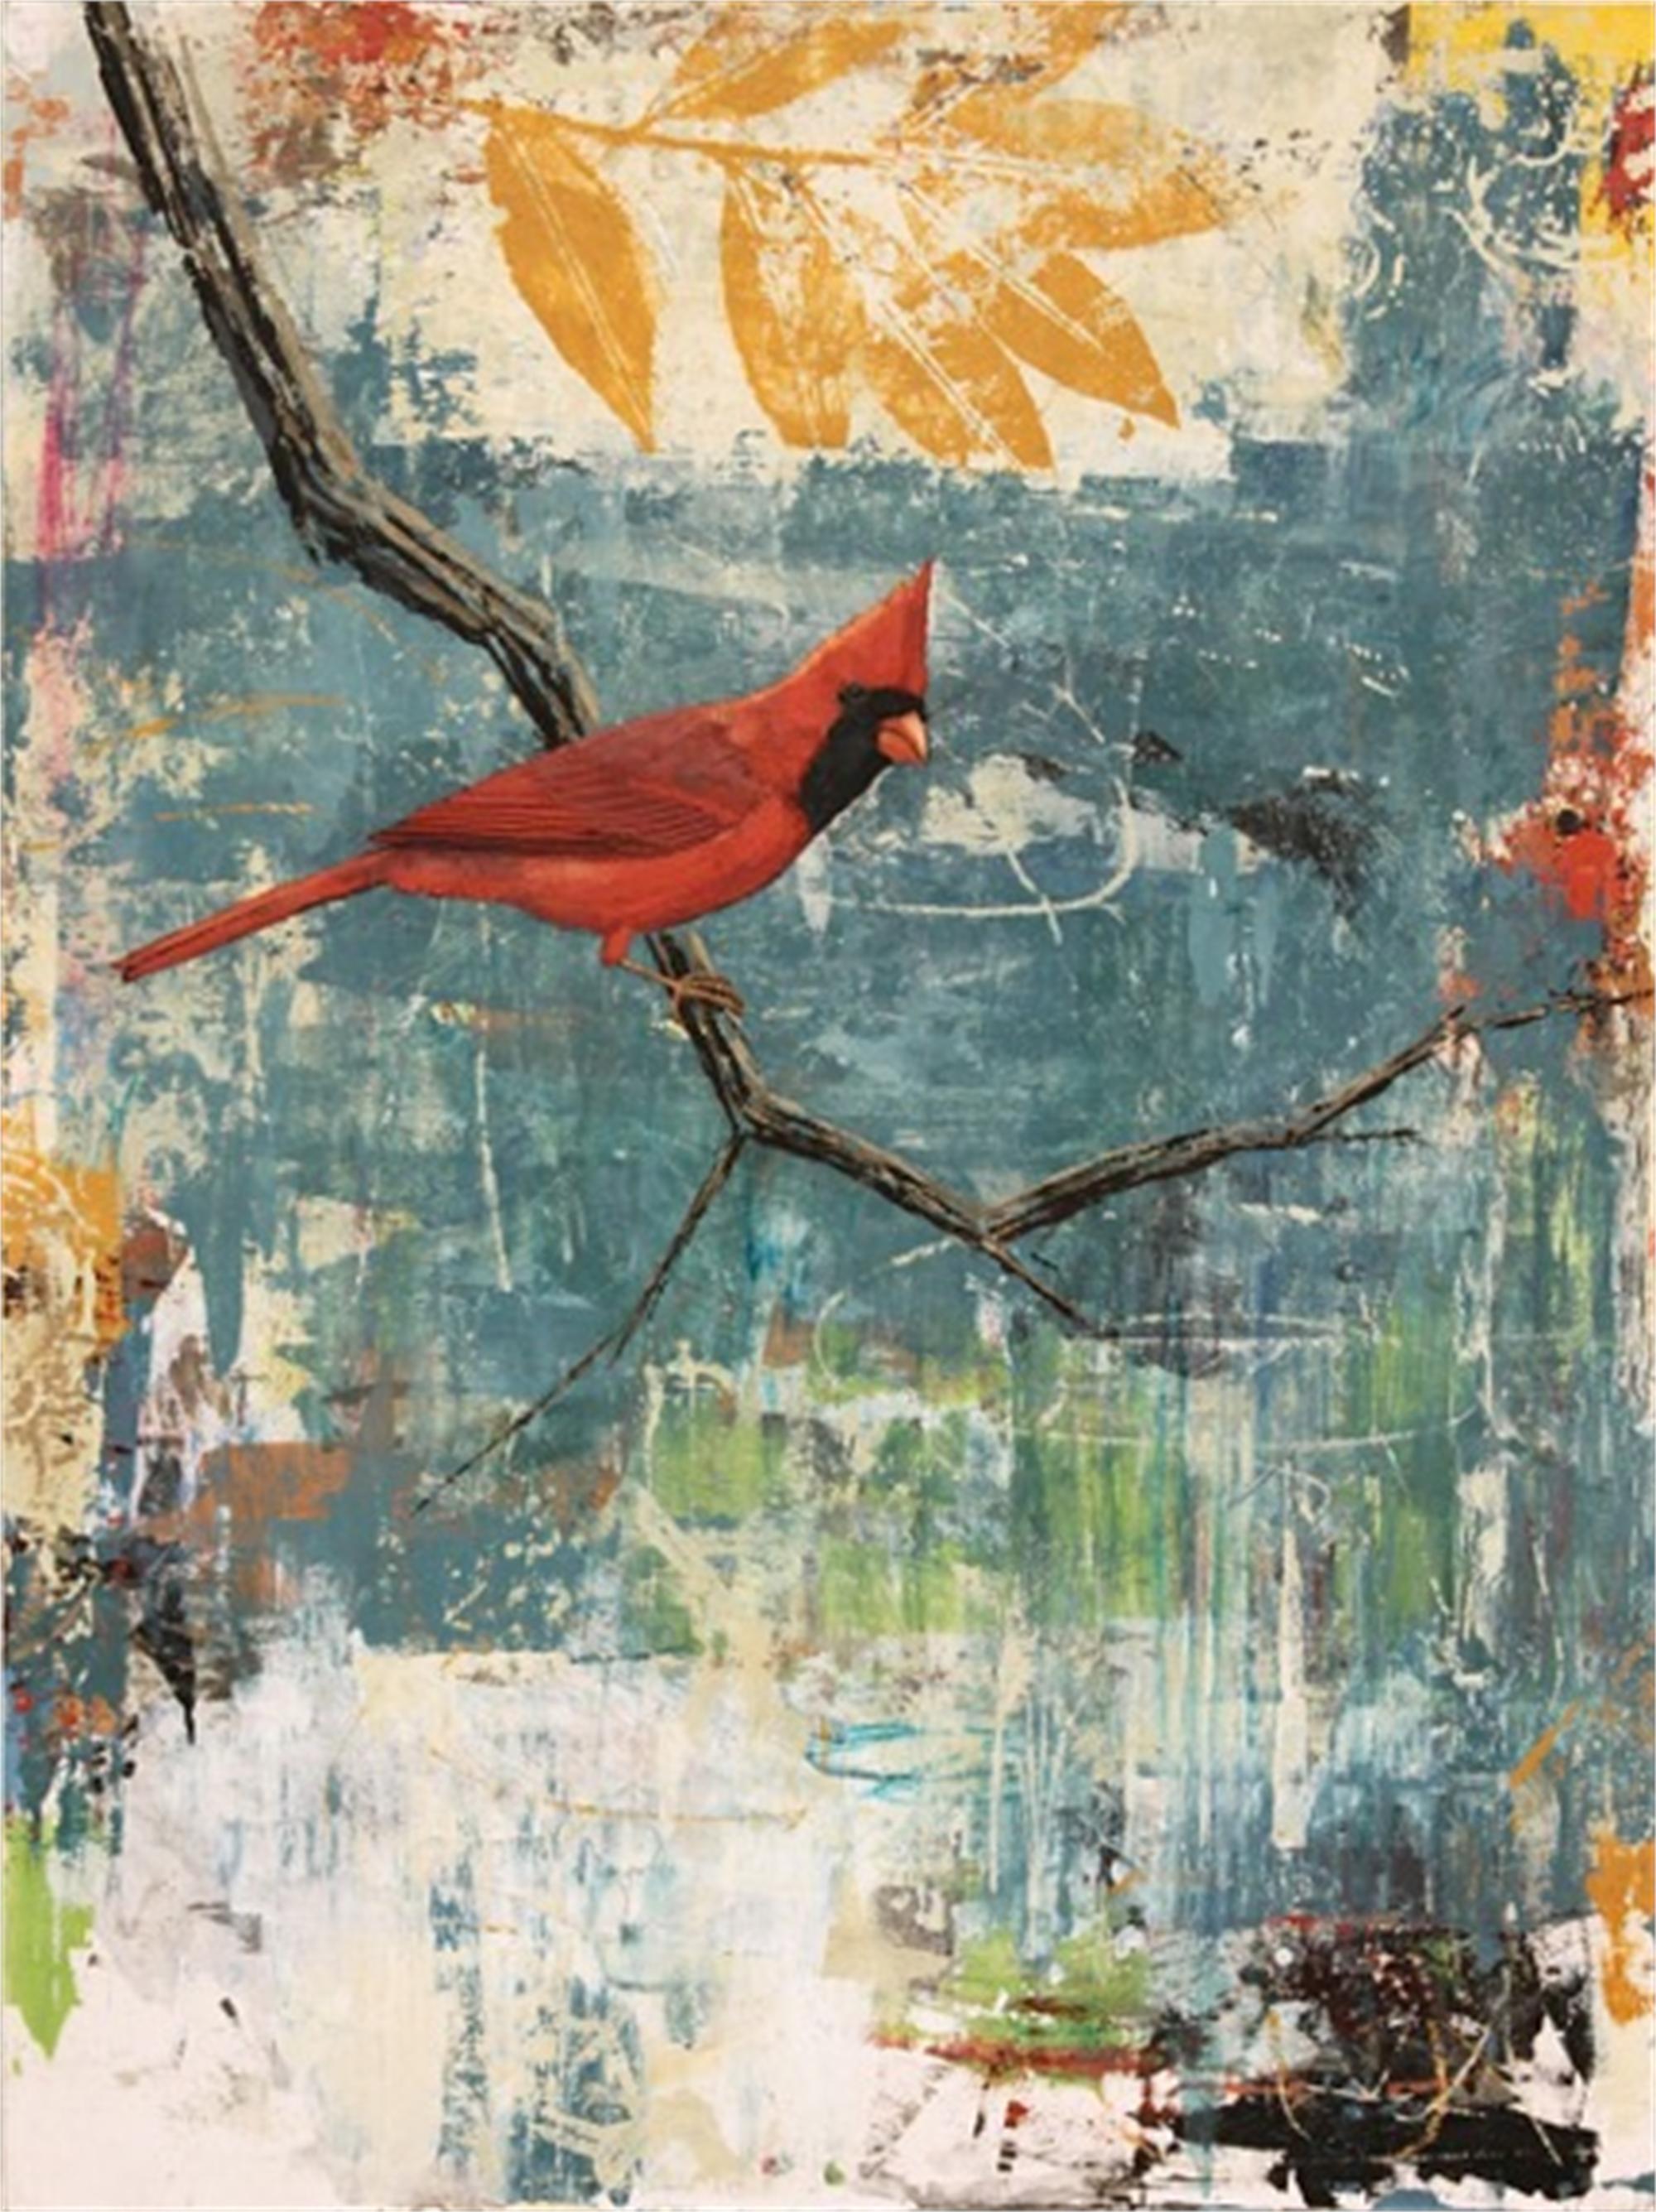 Cardinal #2 by Paul Brigham